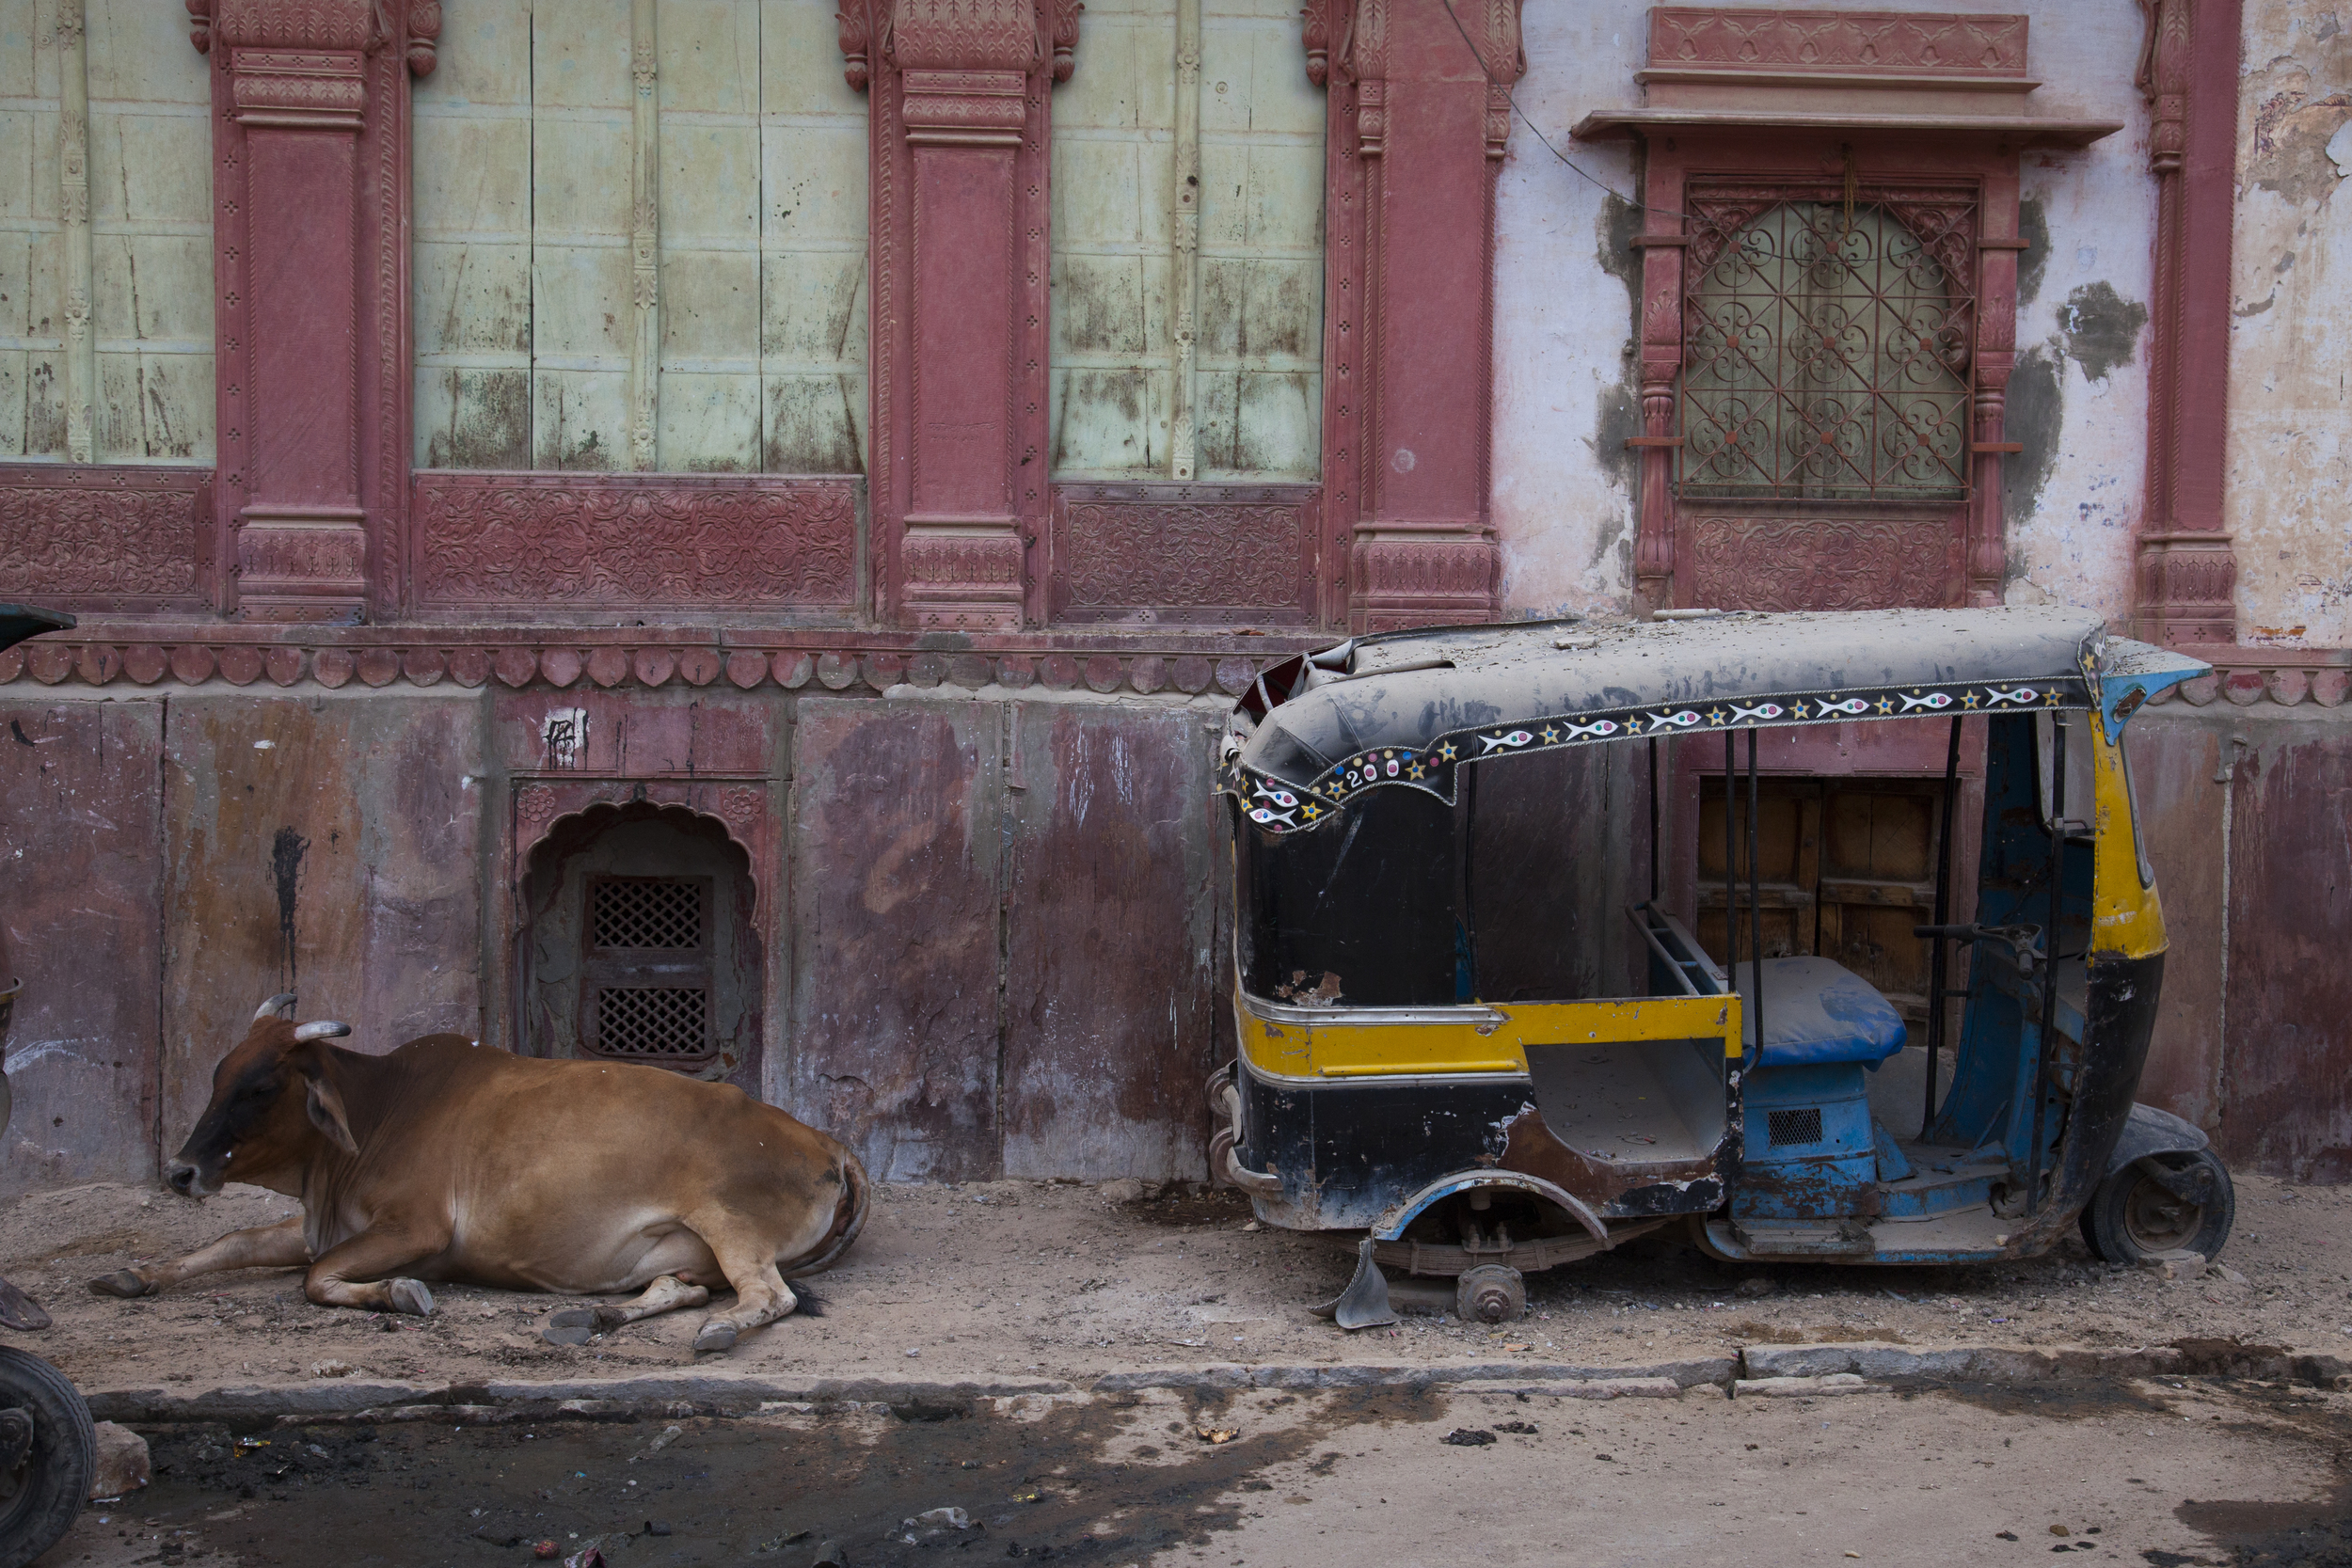 Street scene, Bikaner